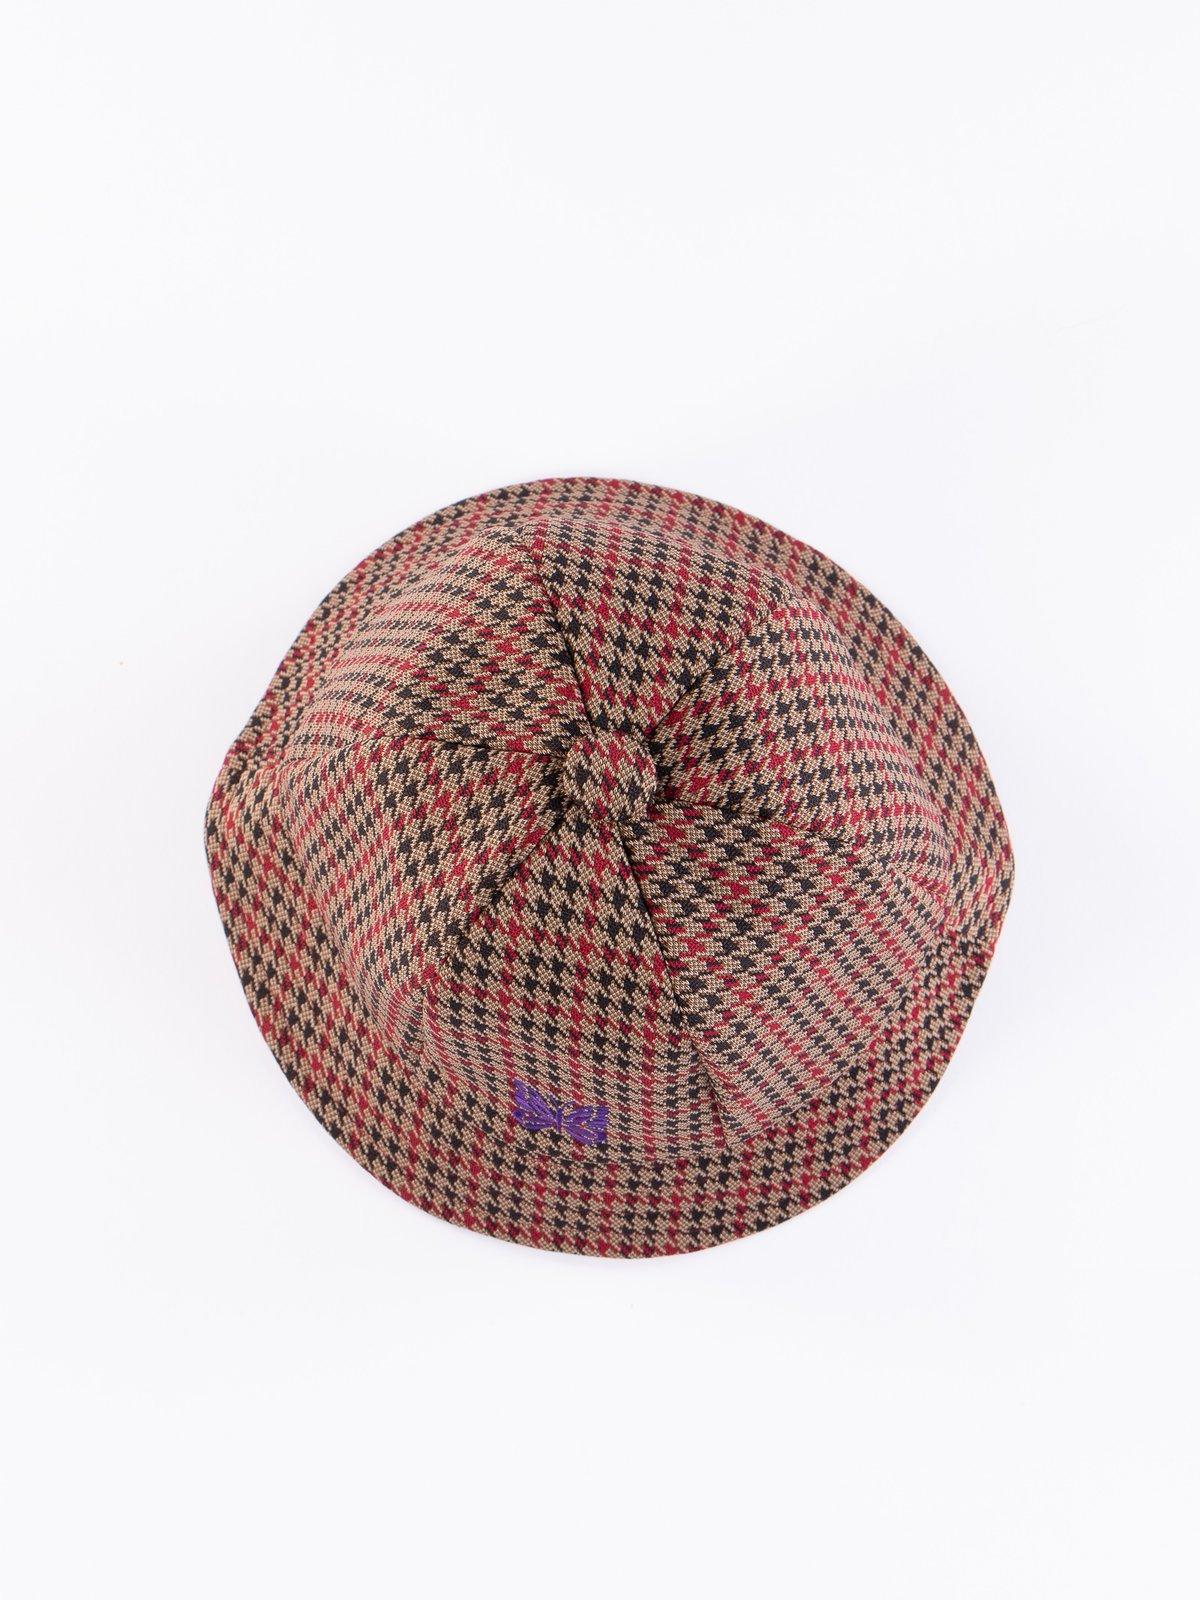 Houndstooth Poly Jacquard Bermuda Hat - Image 4